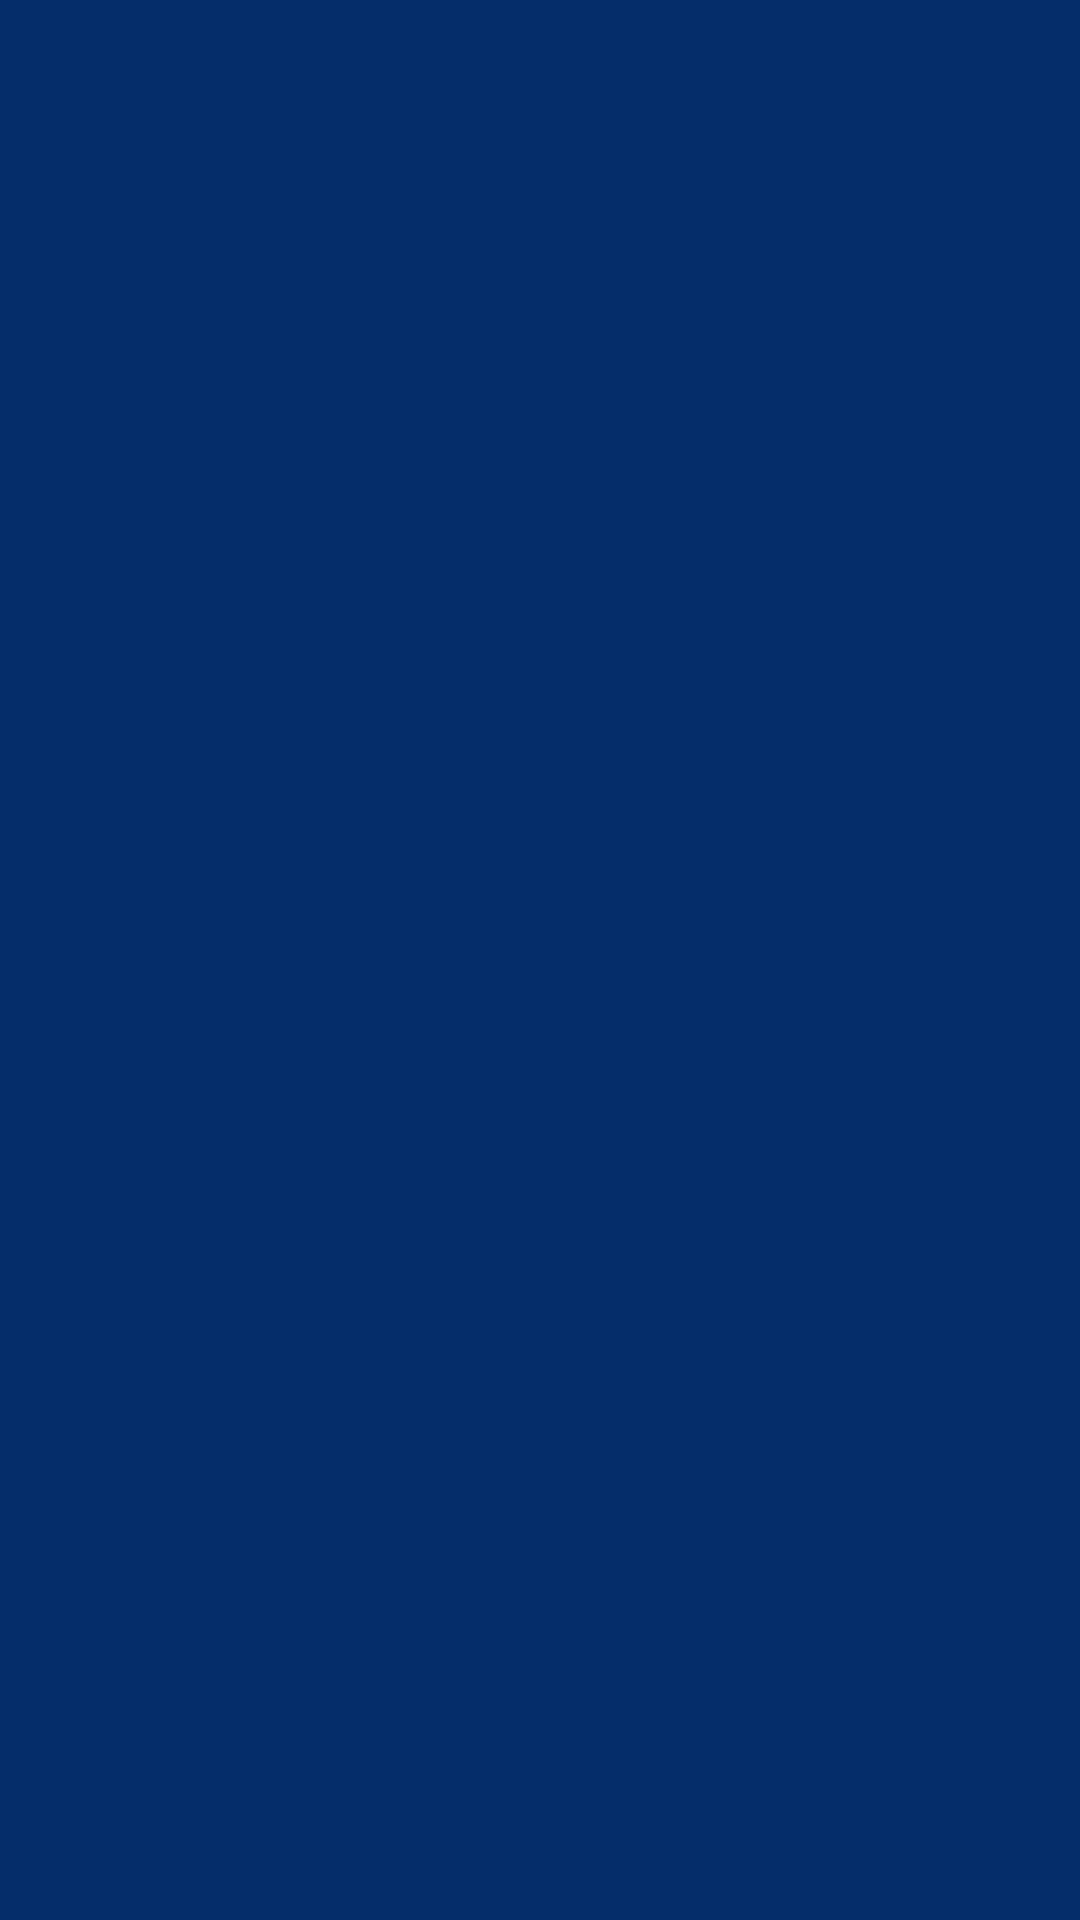 Solid Color Wallpaper Bing Images Minimal Wallpaper Blue Wallpapers Wallpaper